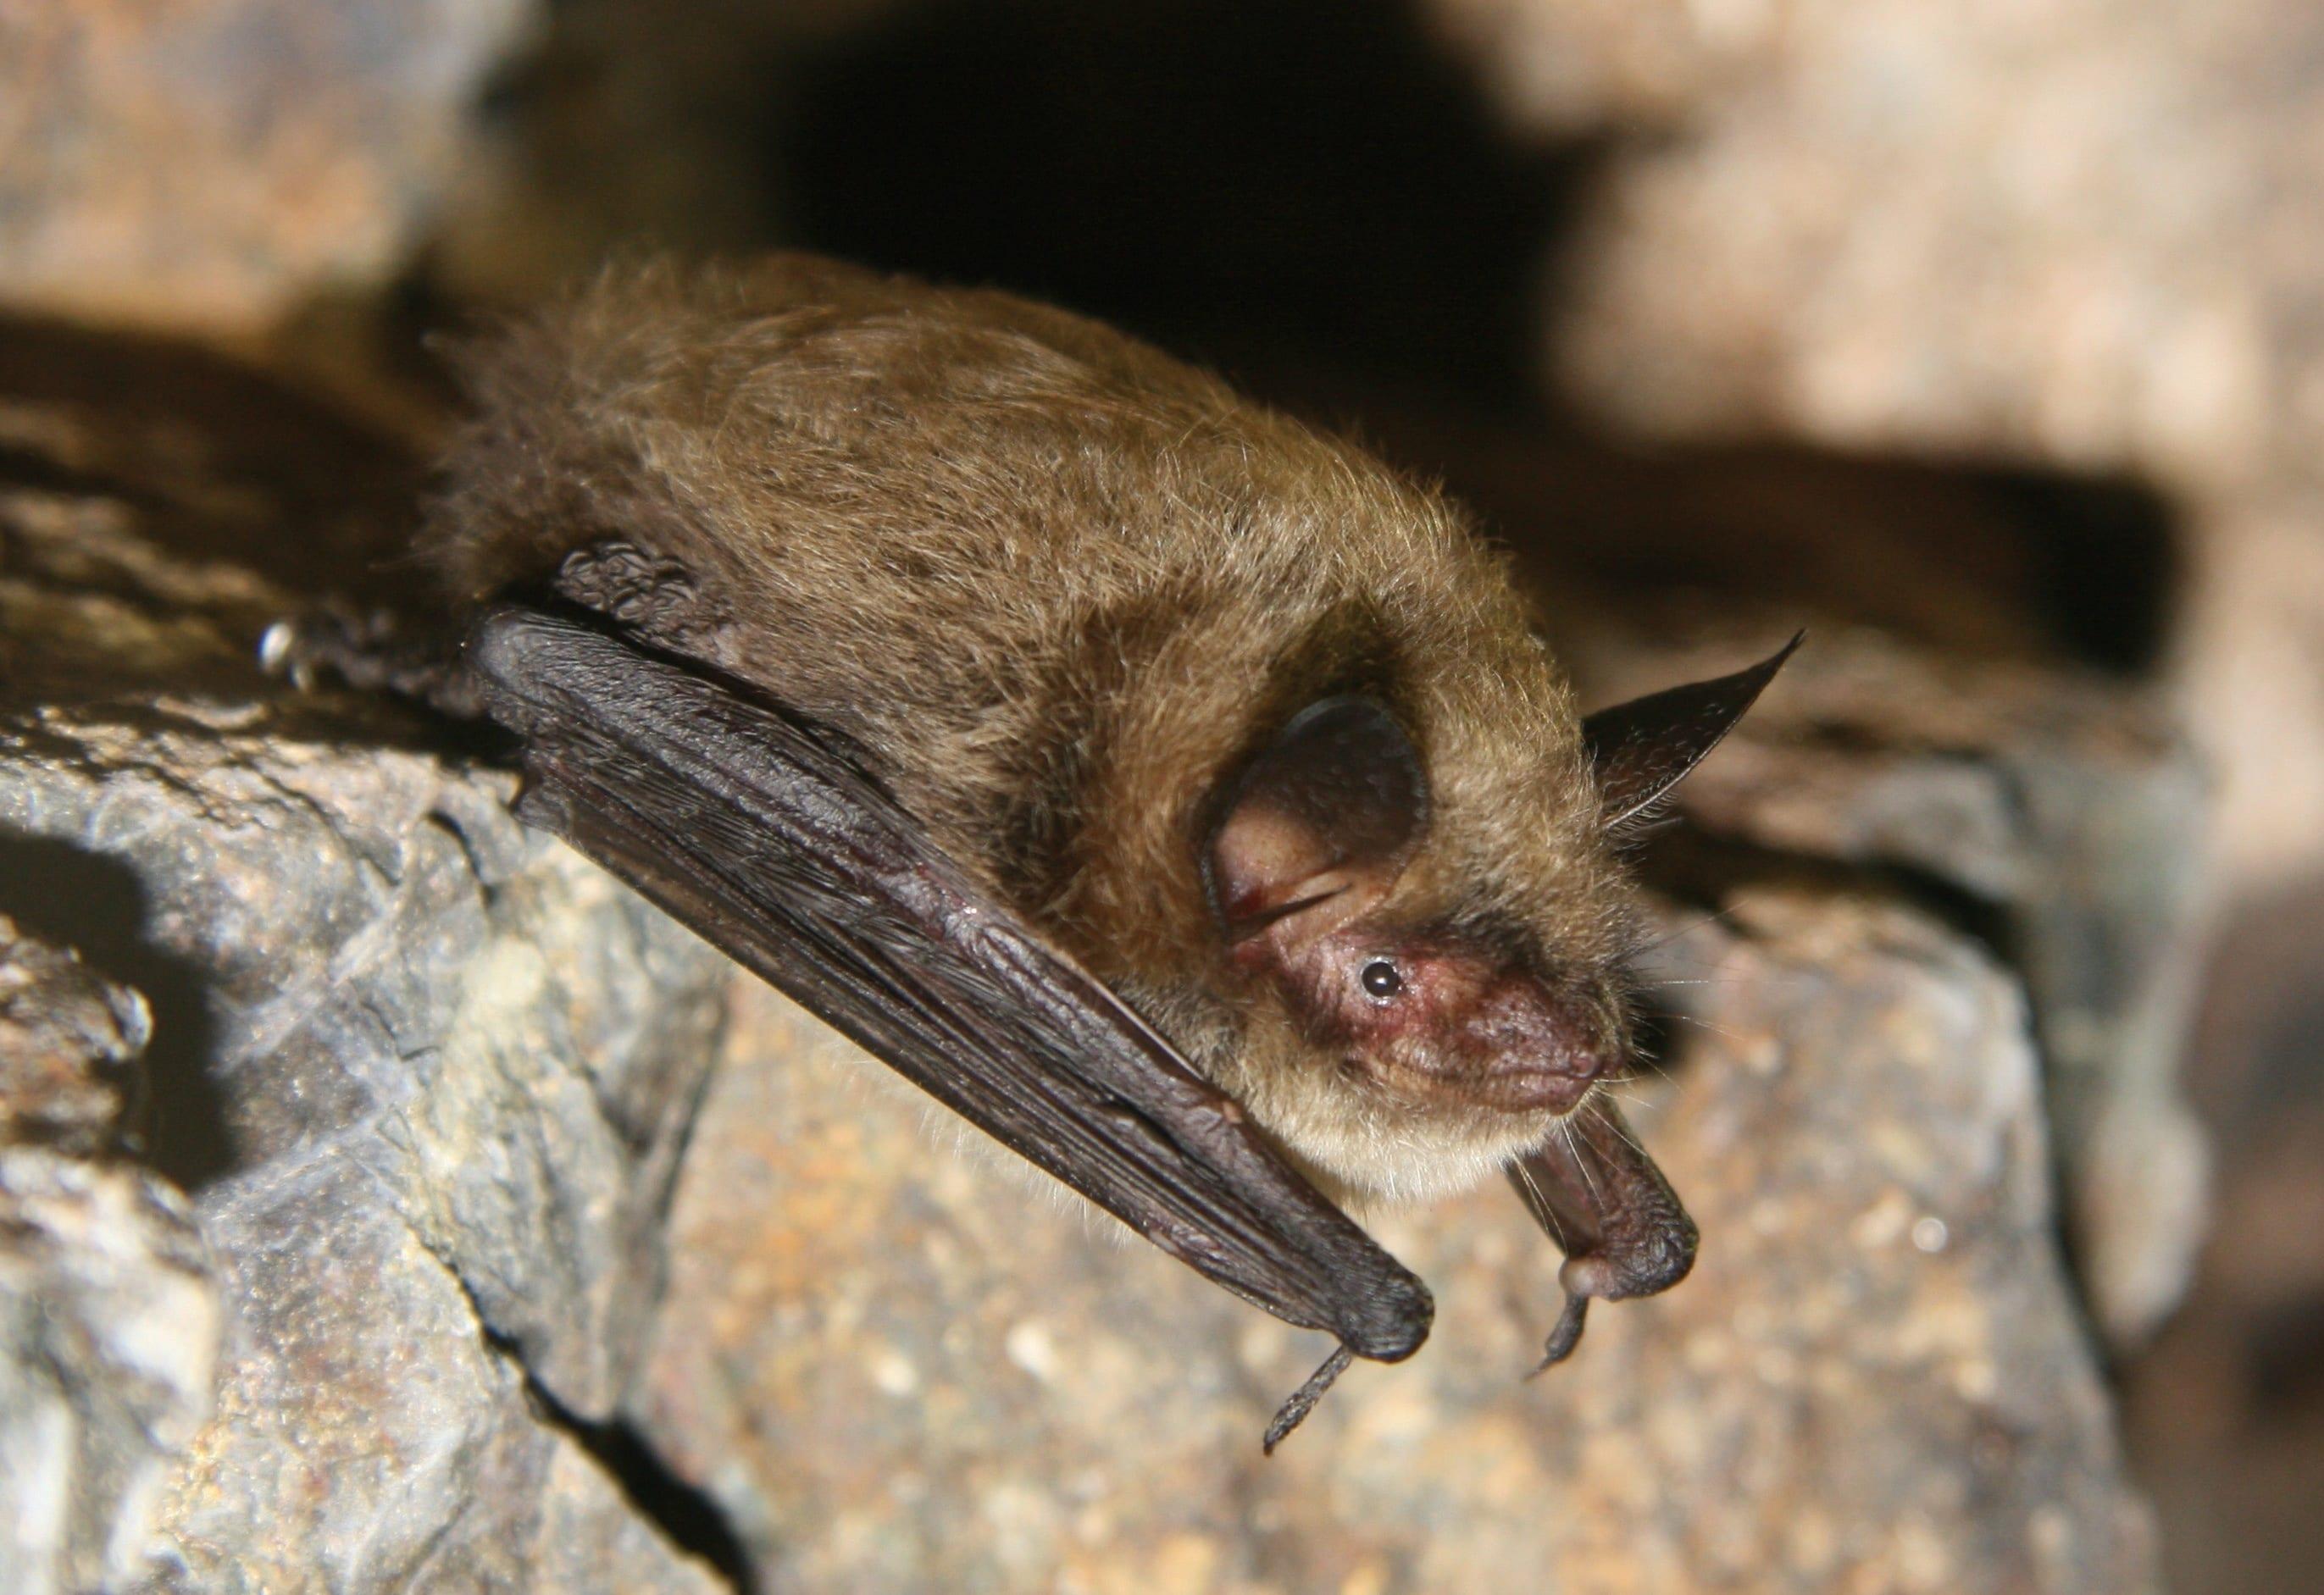 Found An Injured Bat Bat Conservation International